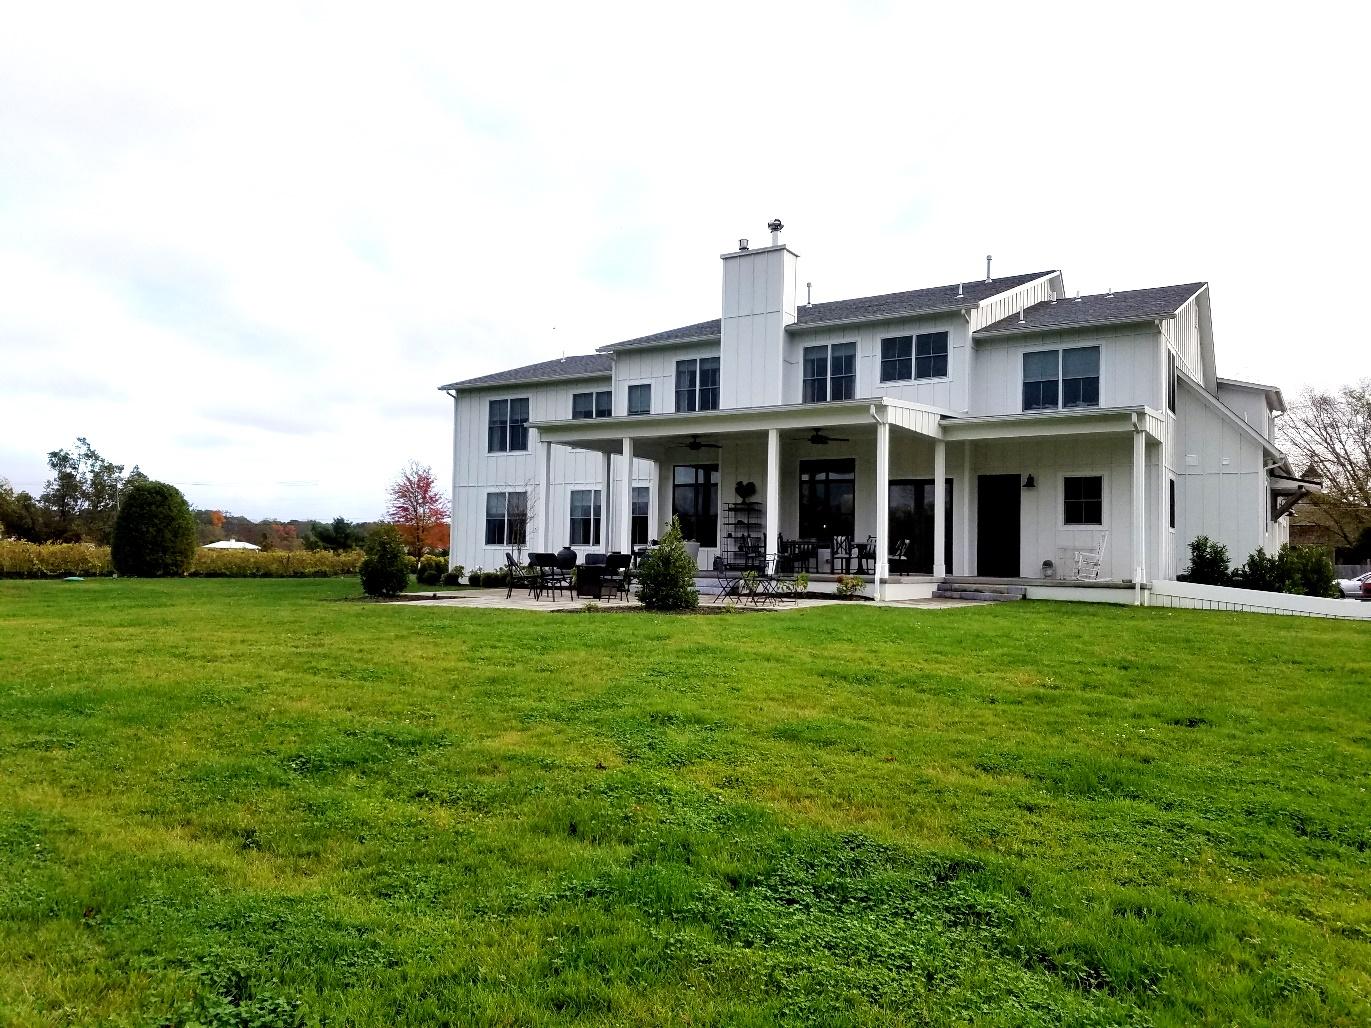 Photo Credit: Wine Casual, White Horse Winery Farmhouse backyard. Wine Casual